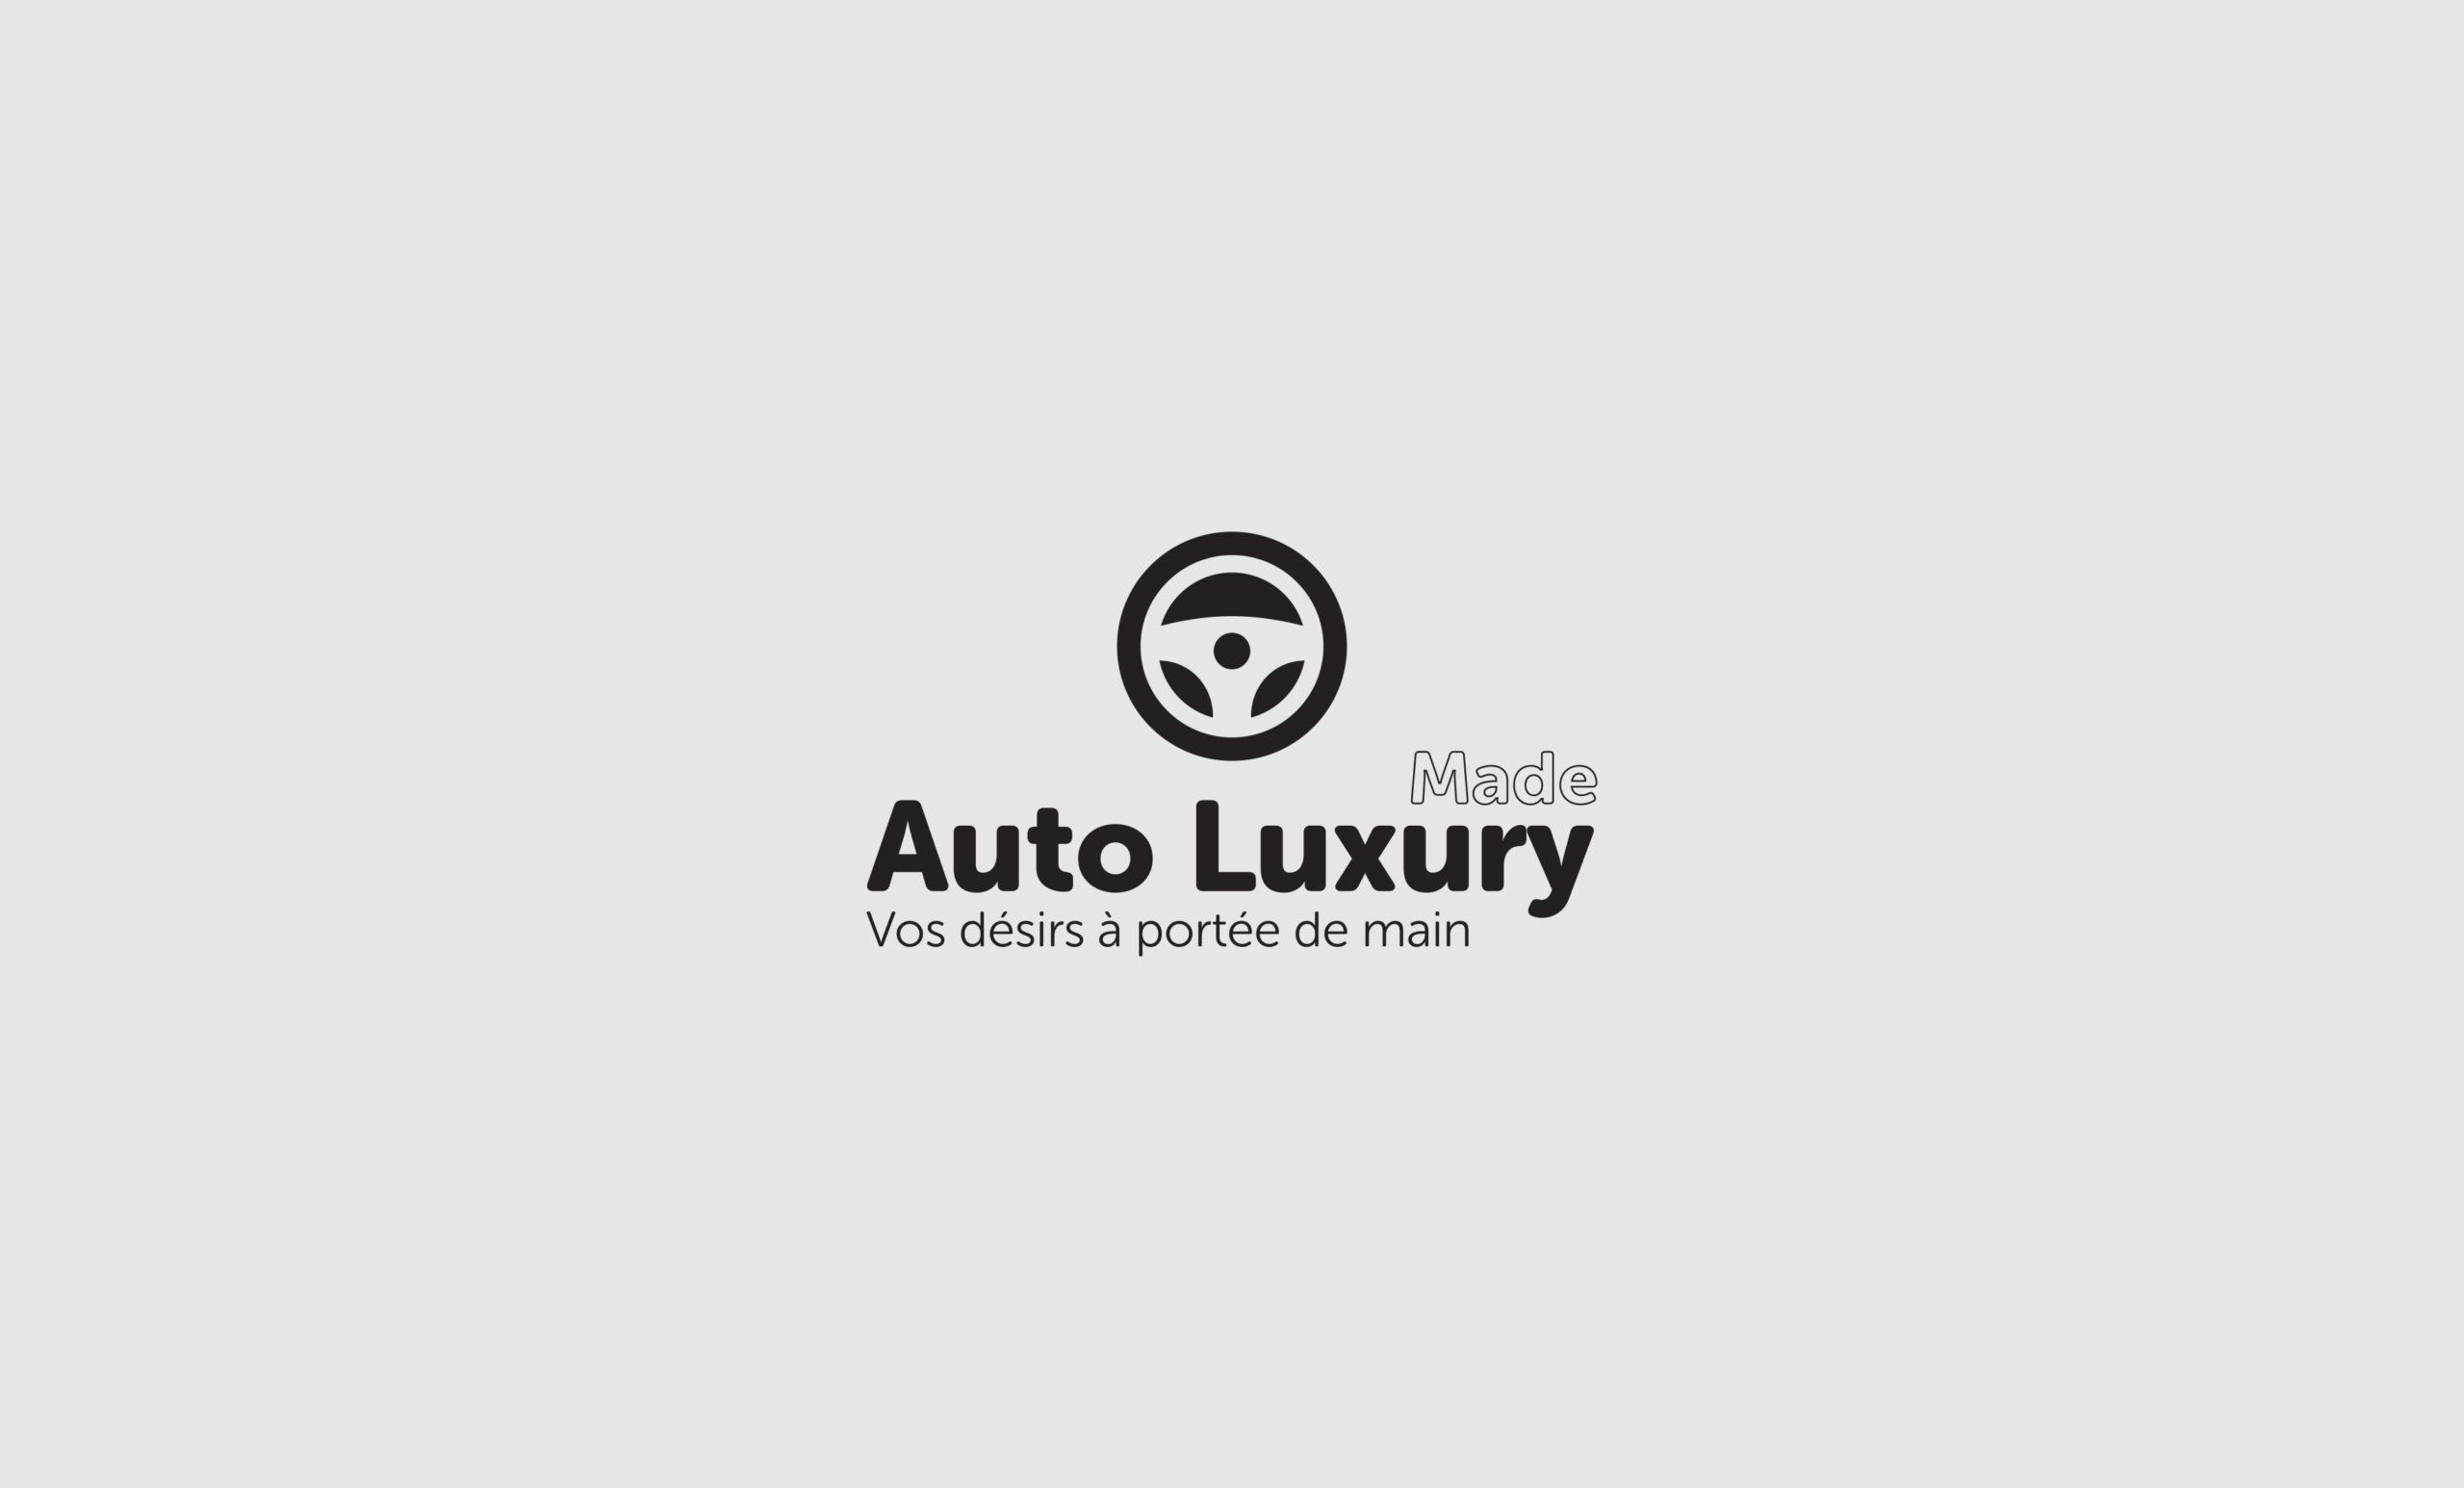 logo-auto-luxury-made